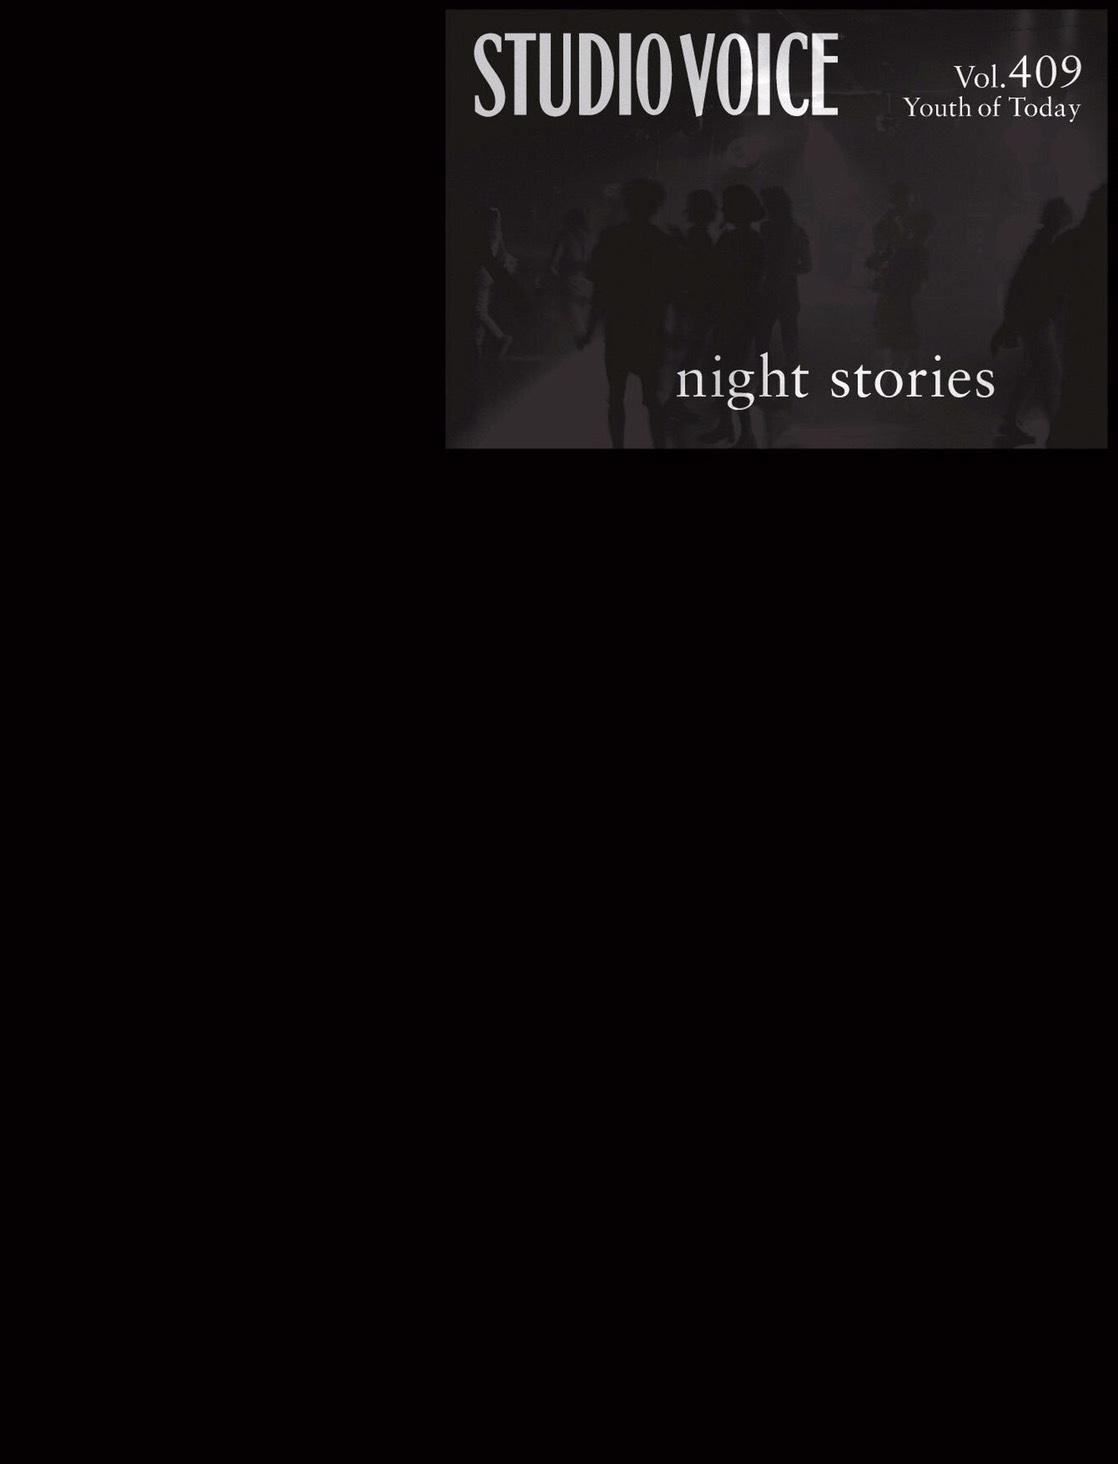 STUDIOVOICE night storiesにマヒトゥ・ザ・ピーポーの企画が掲載されました。